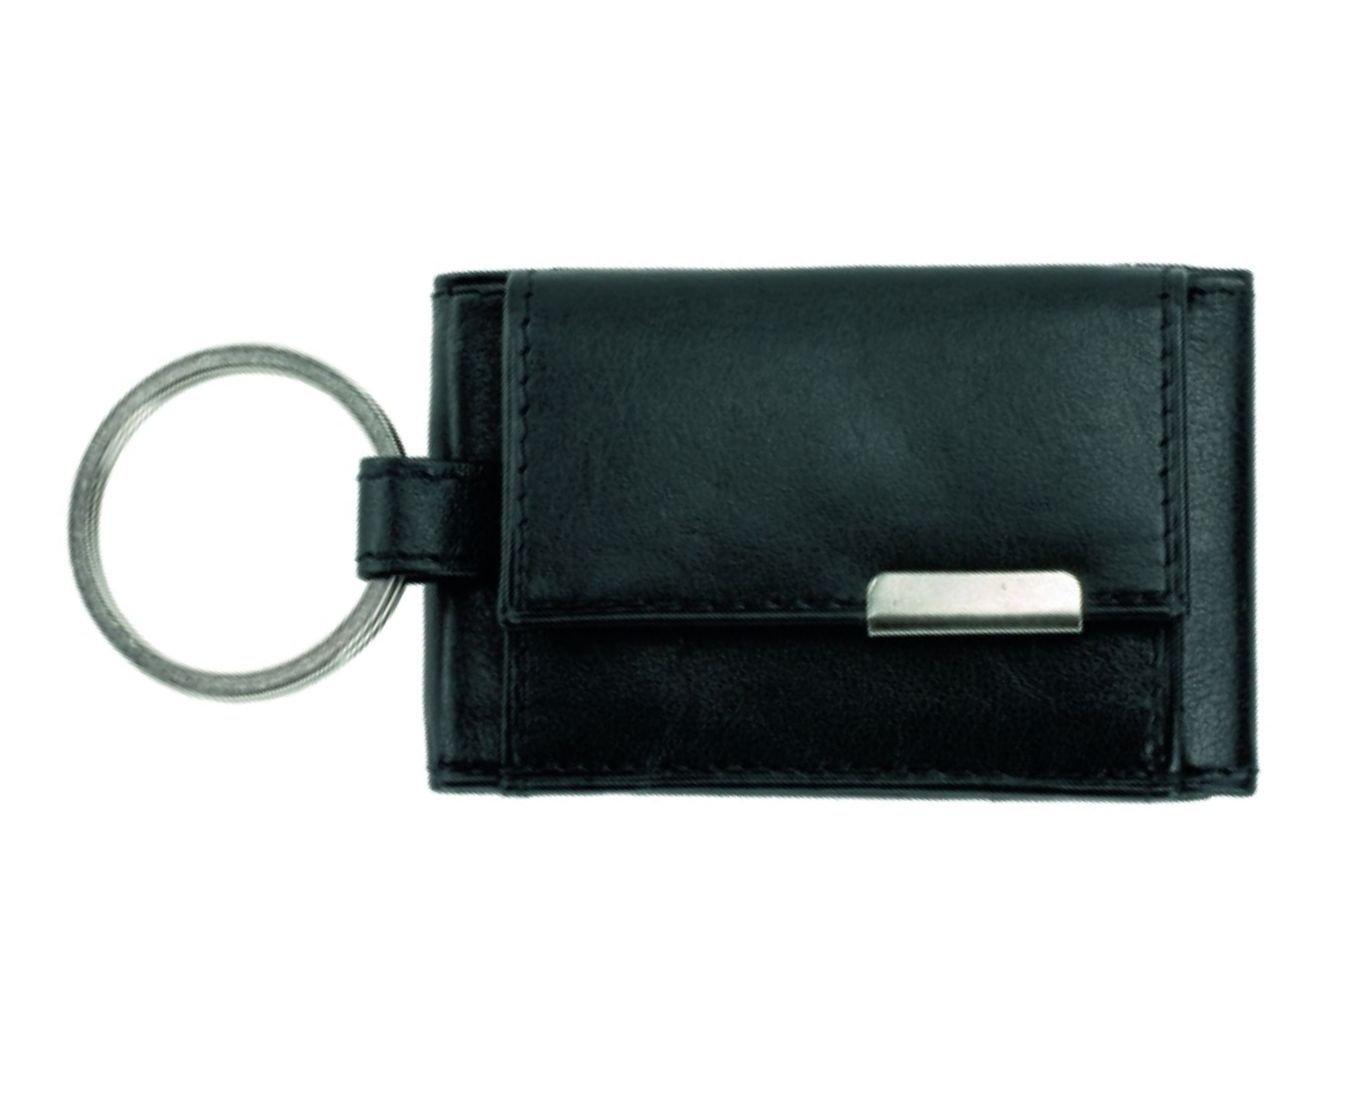 Alassio - 42133 - Mini-Börse mit Metallemblem, Echt Leder, schwarz